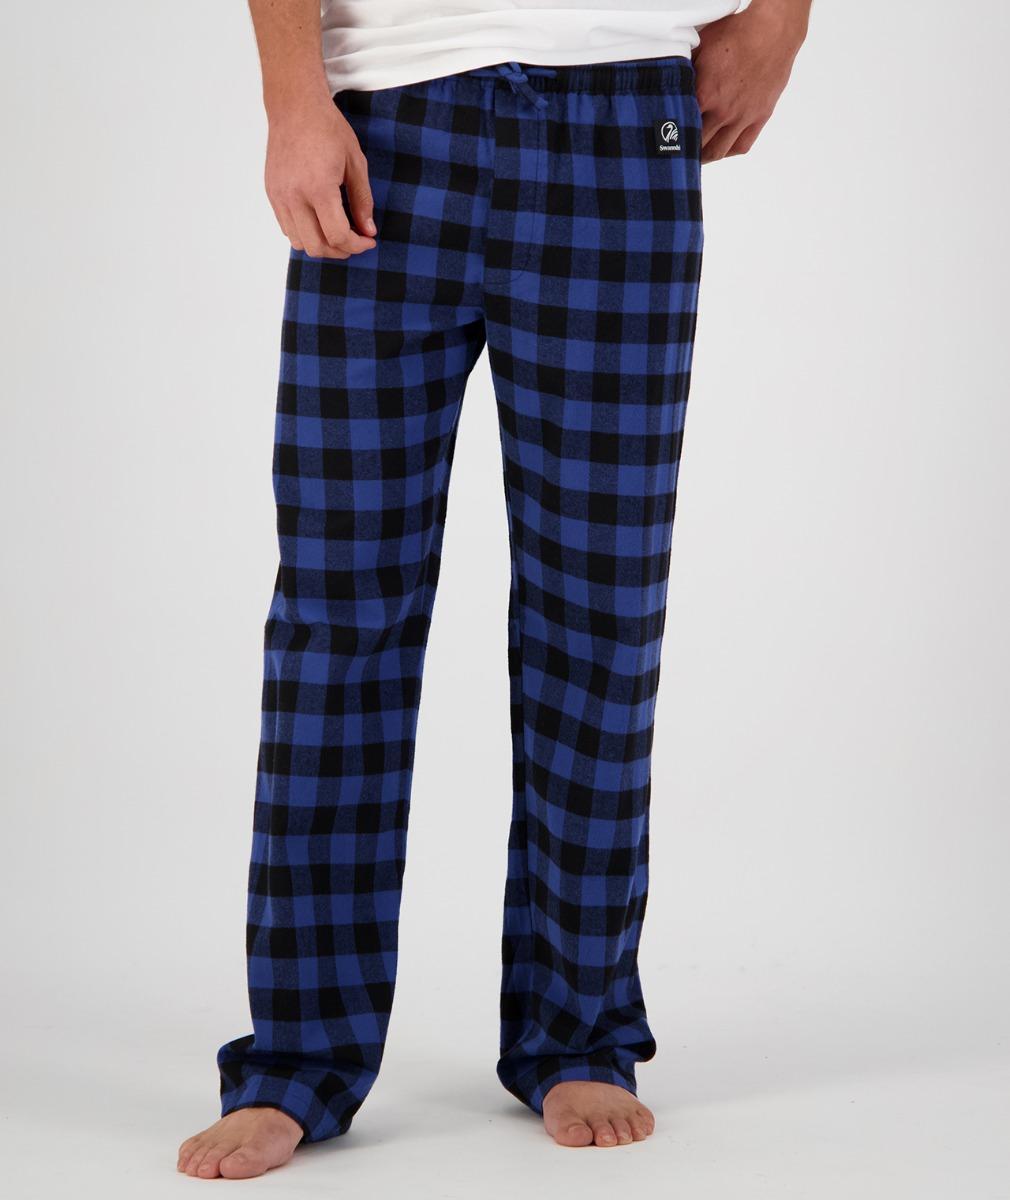 Swanndri Men's Cotton Westend Sleep Pant in Blue/Black Check